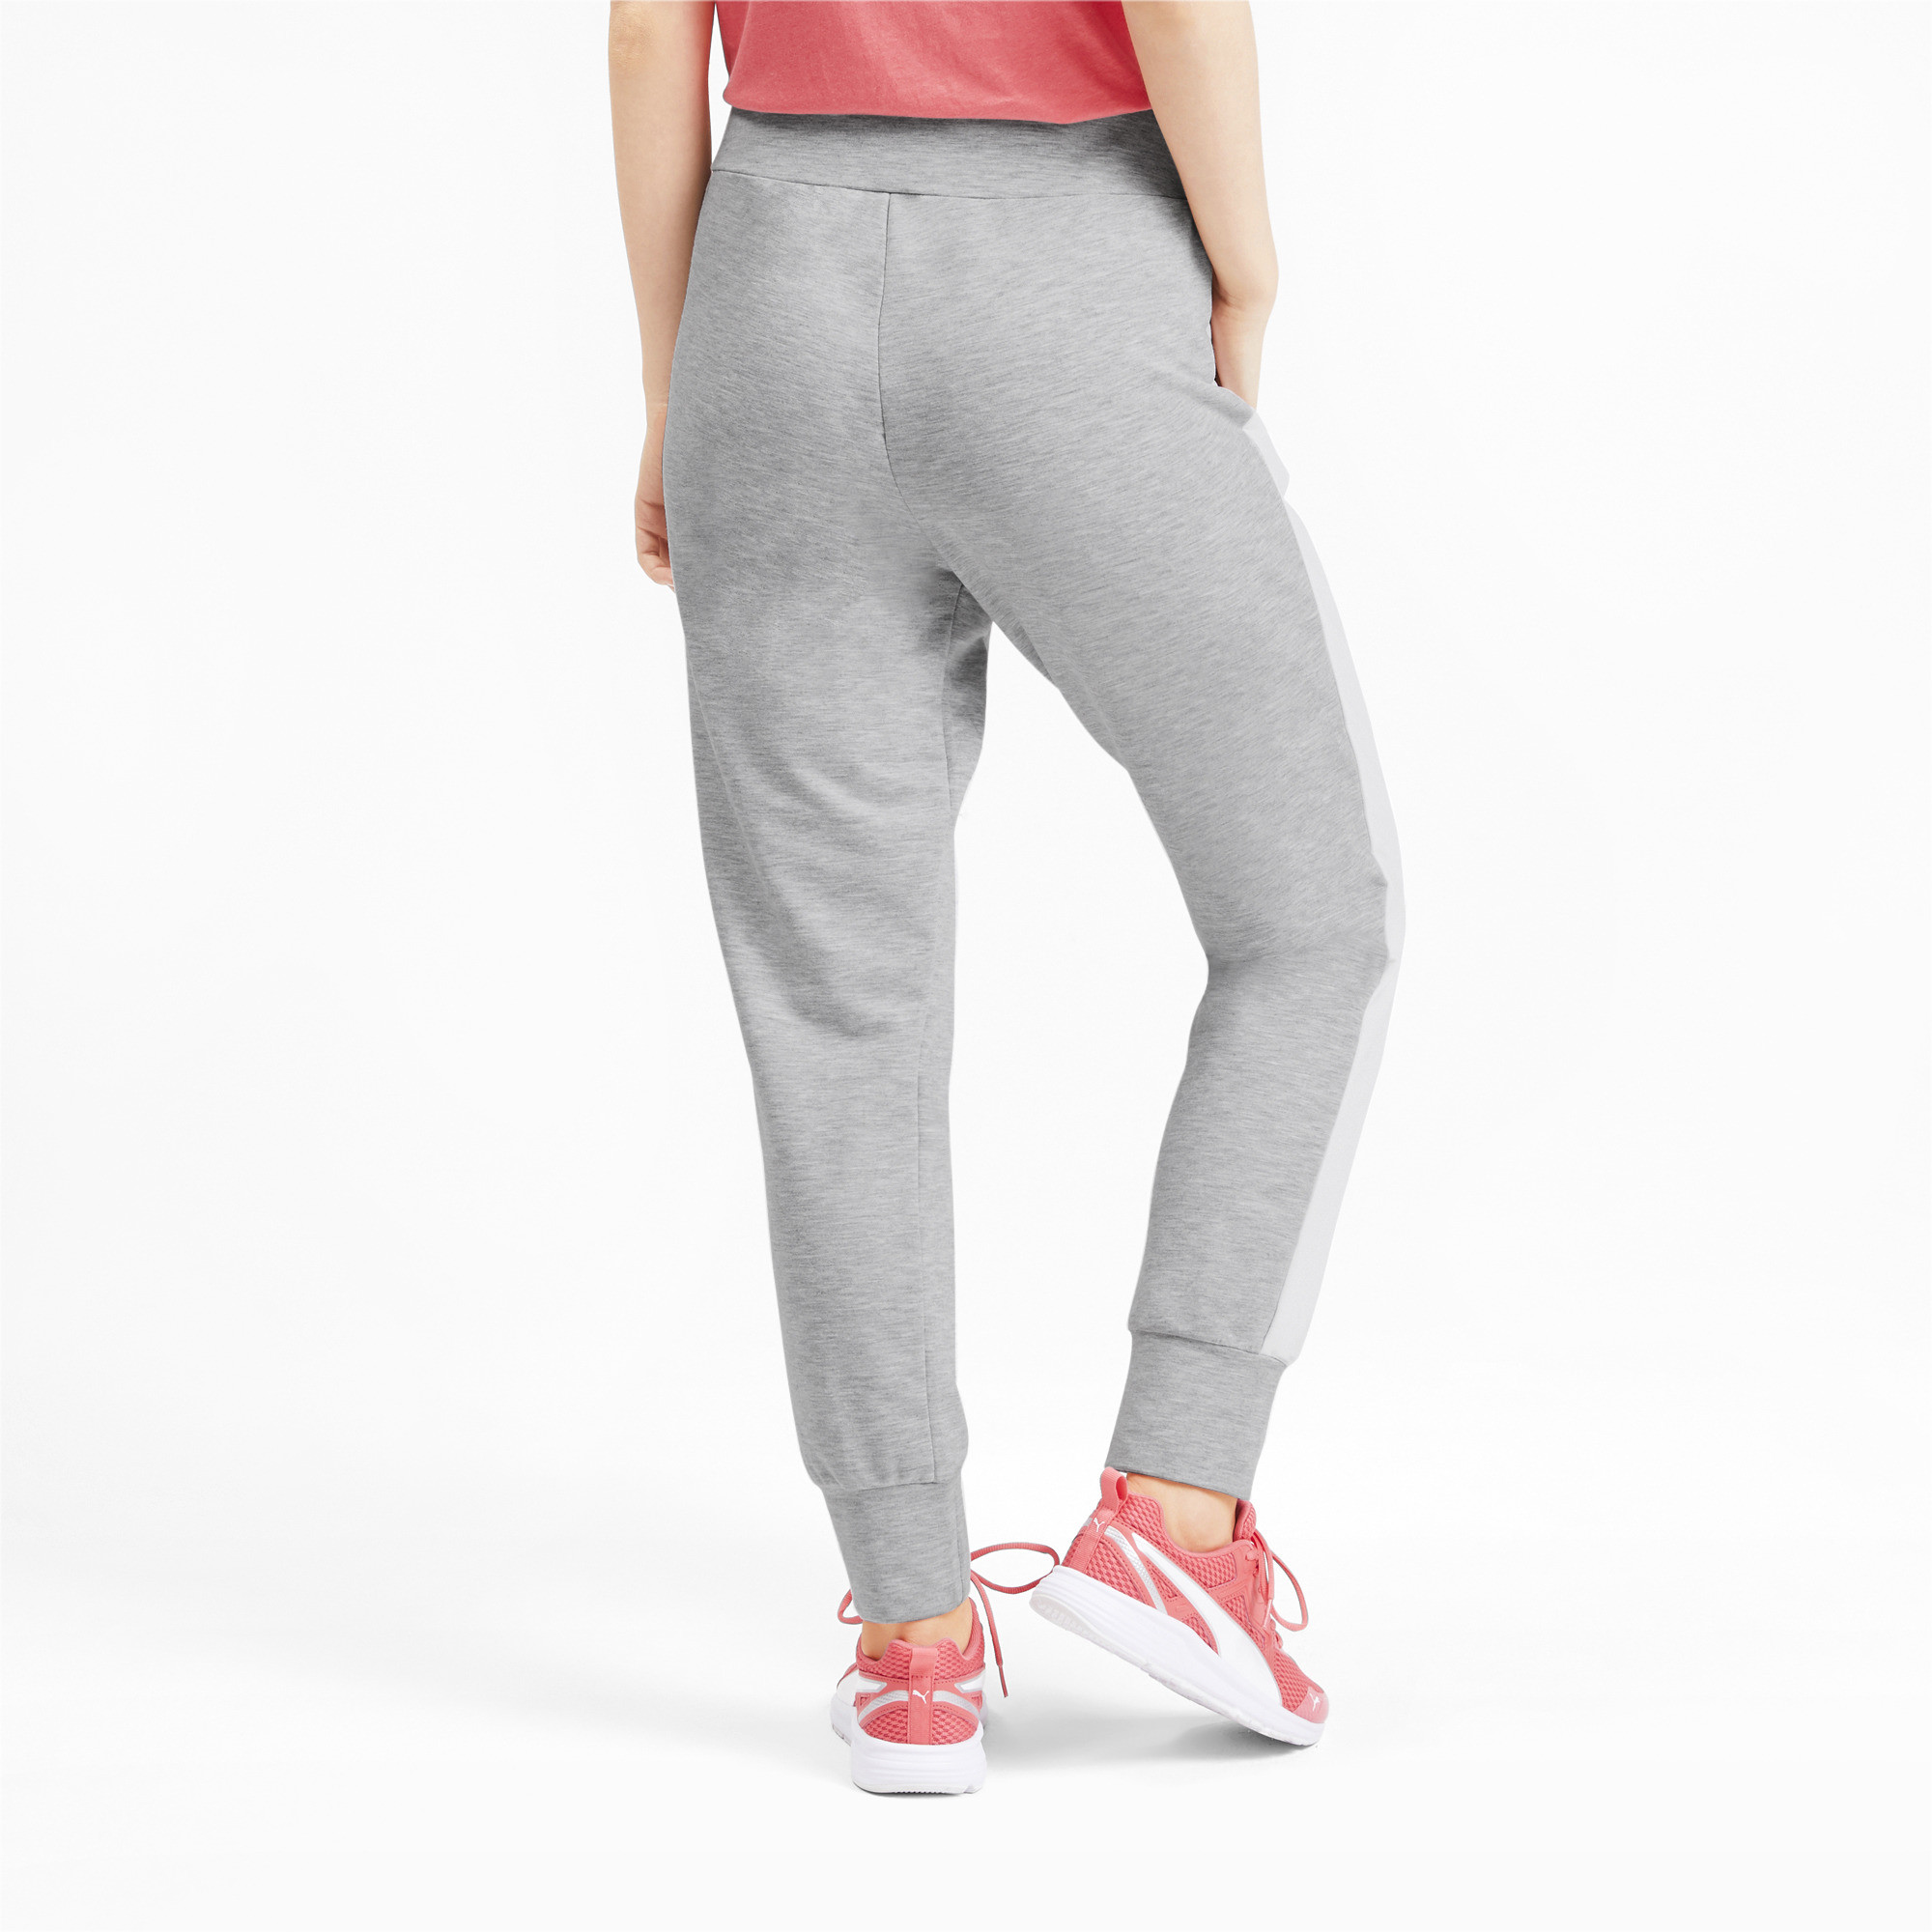 PUMA-Modern-Sports-Women-039-s-Track-Pants-Women-Knitted-Pants-Basics thumbnail 10